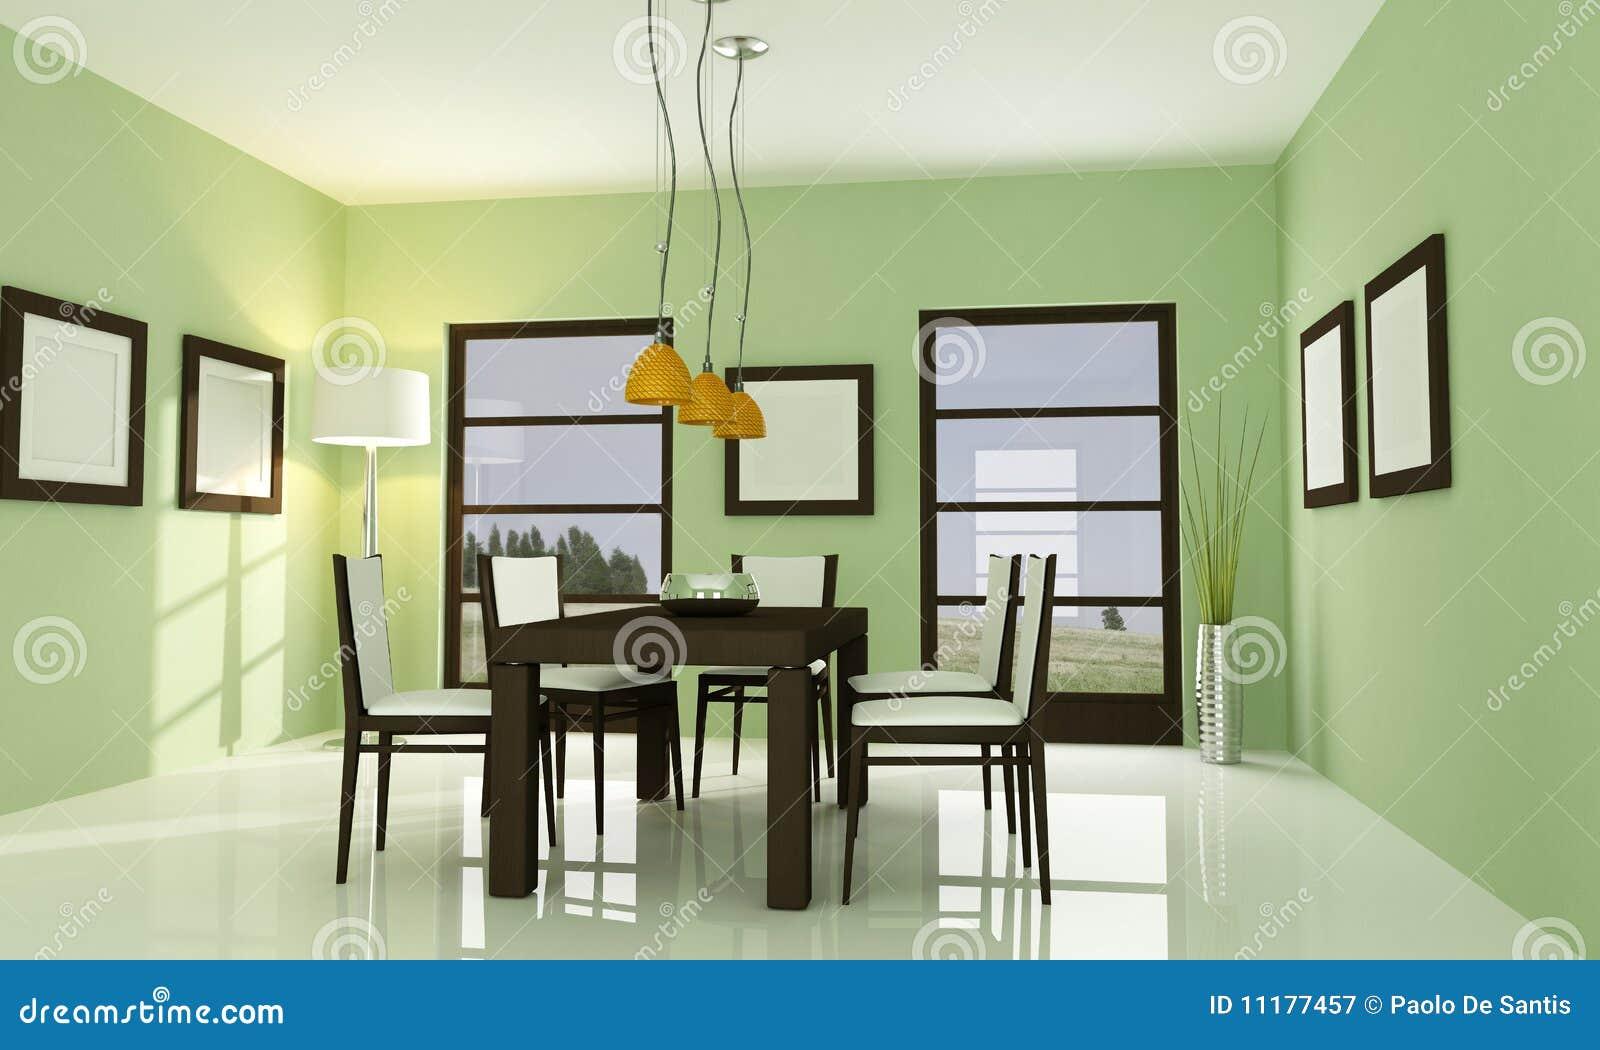 Sala Da Pranzo Verde Contemporanea Fotografia Stock Libera Da Diritti  #B78614 1300 870 Sala Da Pranzo Modello Regina